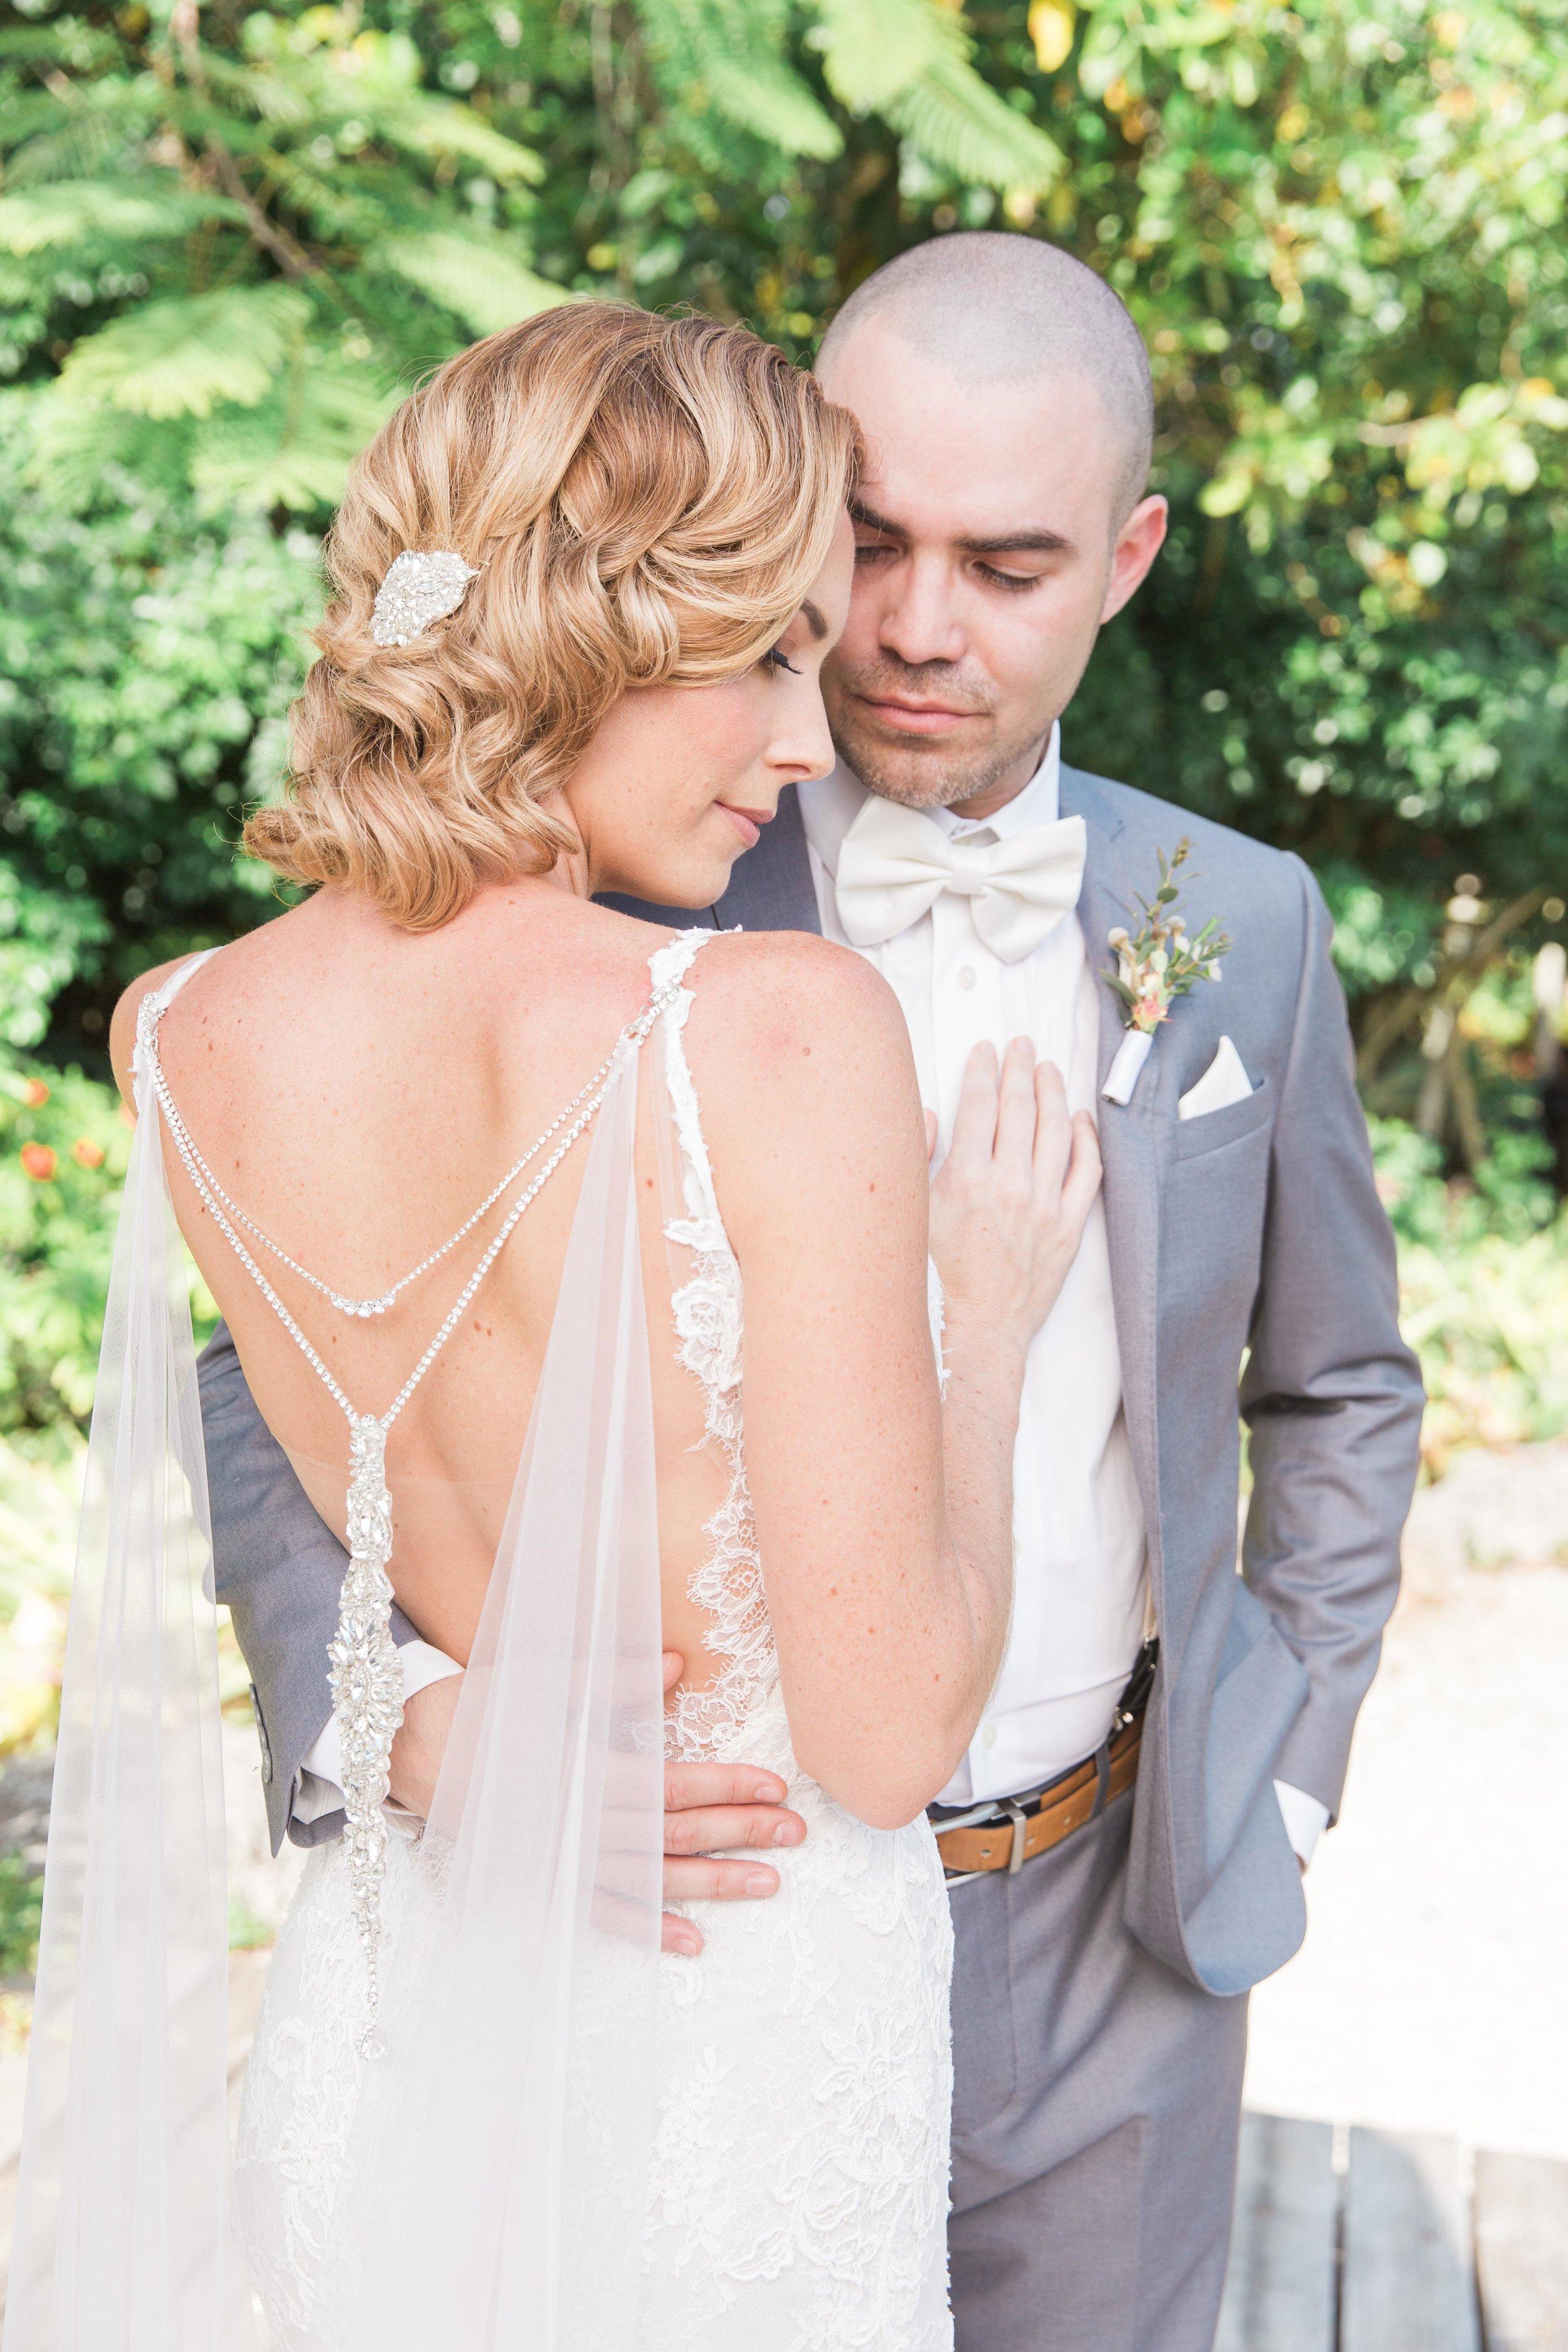 Back Necklace, bridal back drop necklace, Wedding Back Necklace Champagne and GRIT - Copy.jpg